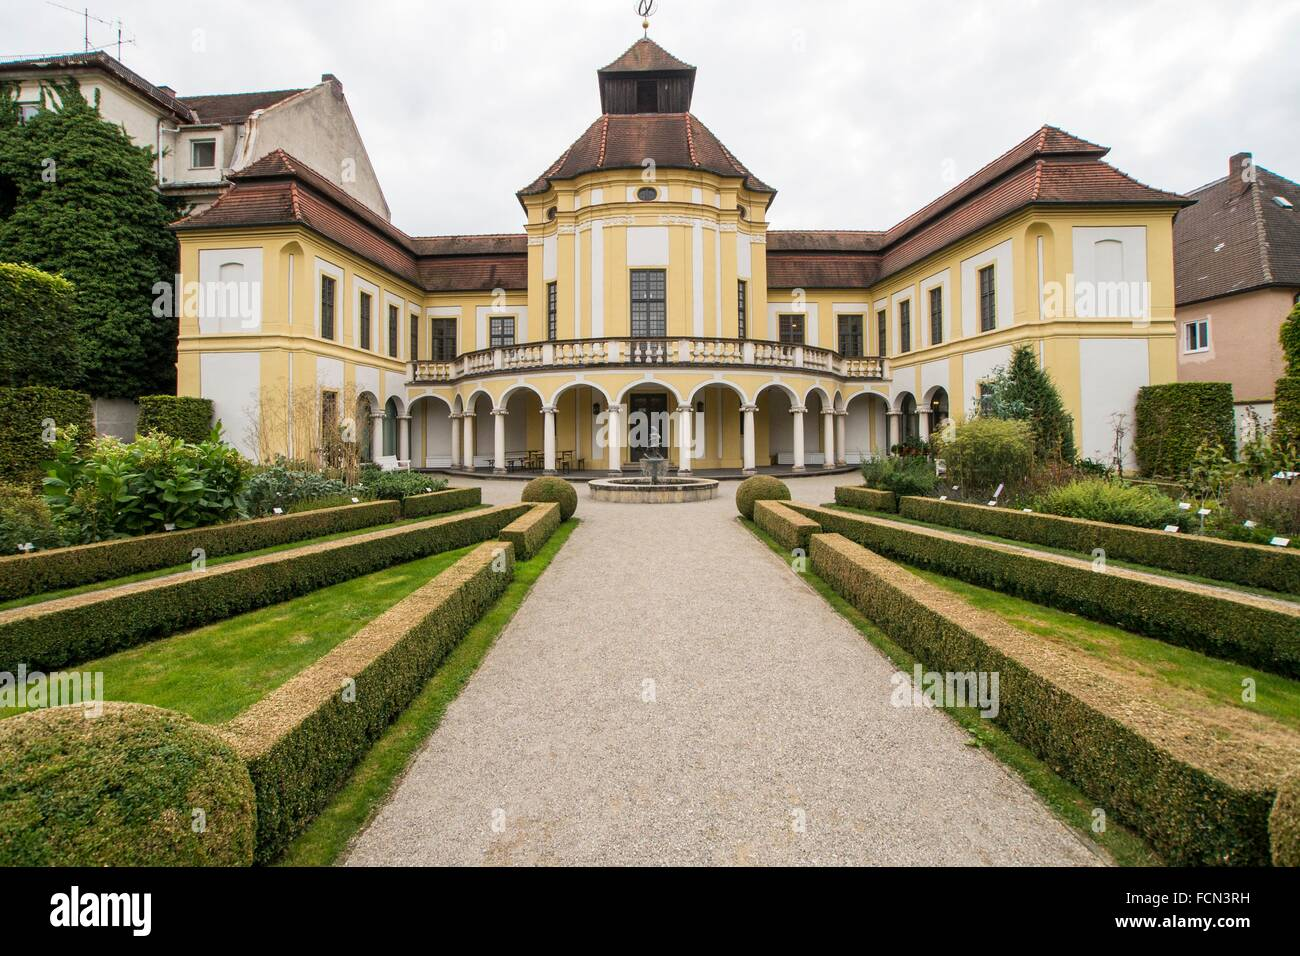 Ingolstadt, Germany,German medicine history museum. Stock Photo